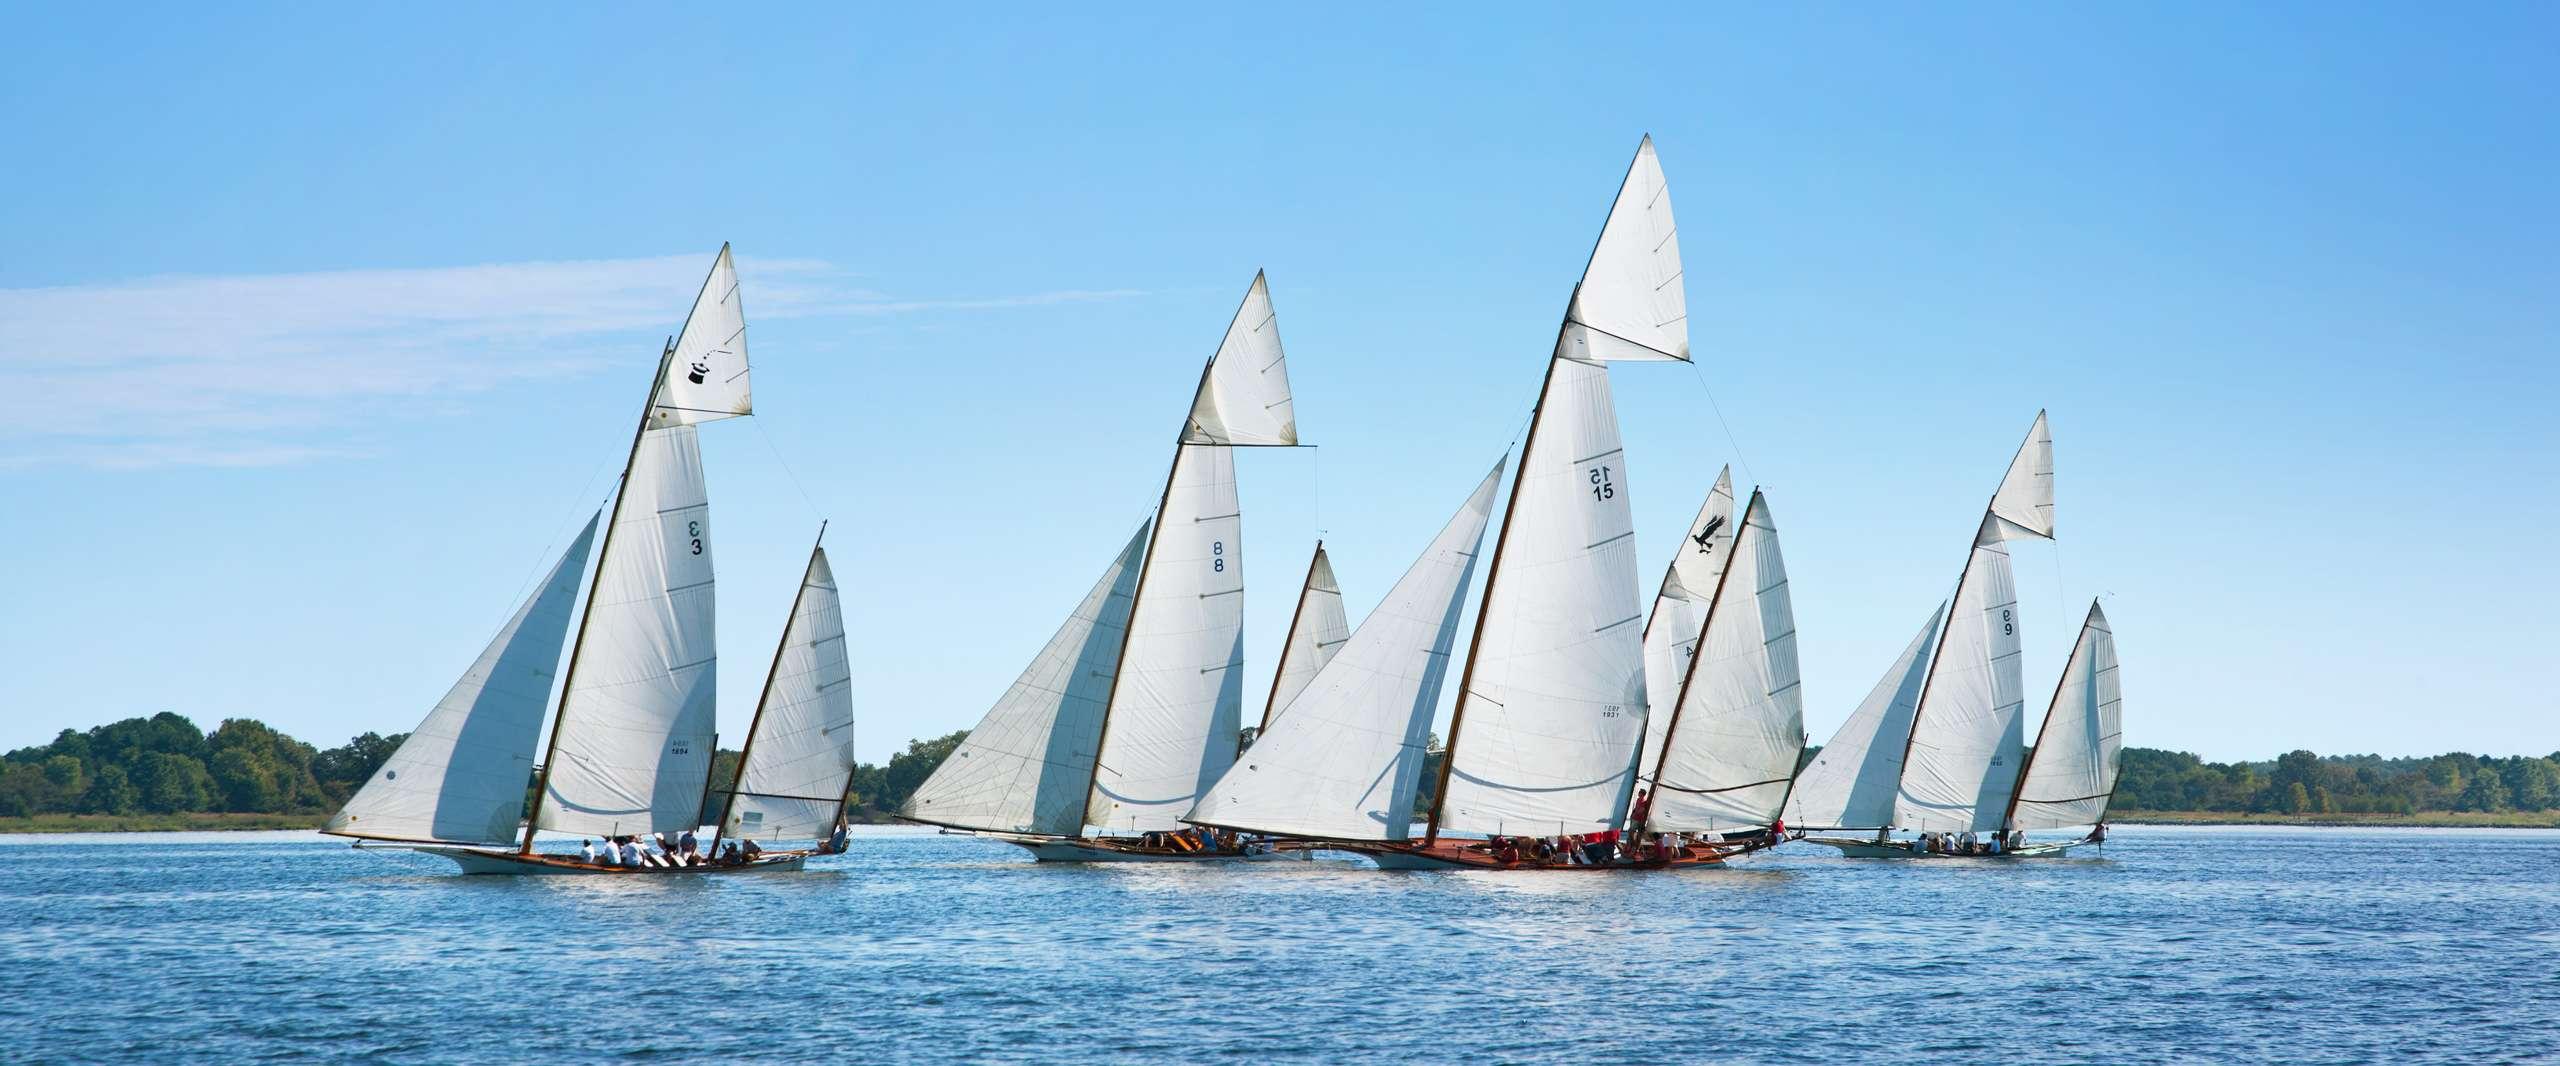 PORTFOLIO - Sailing - Chesapeake #22    PCG564